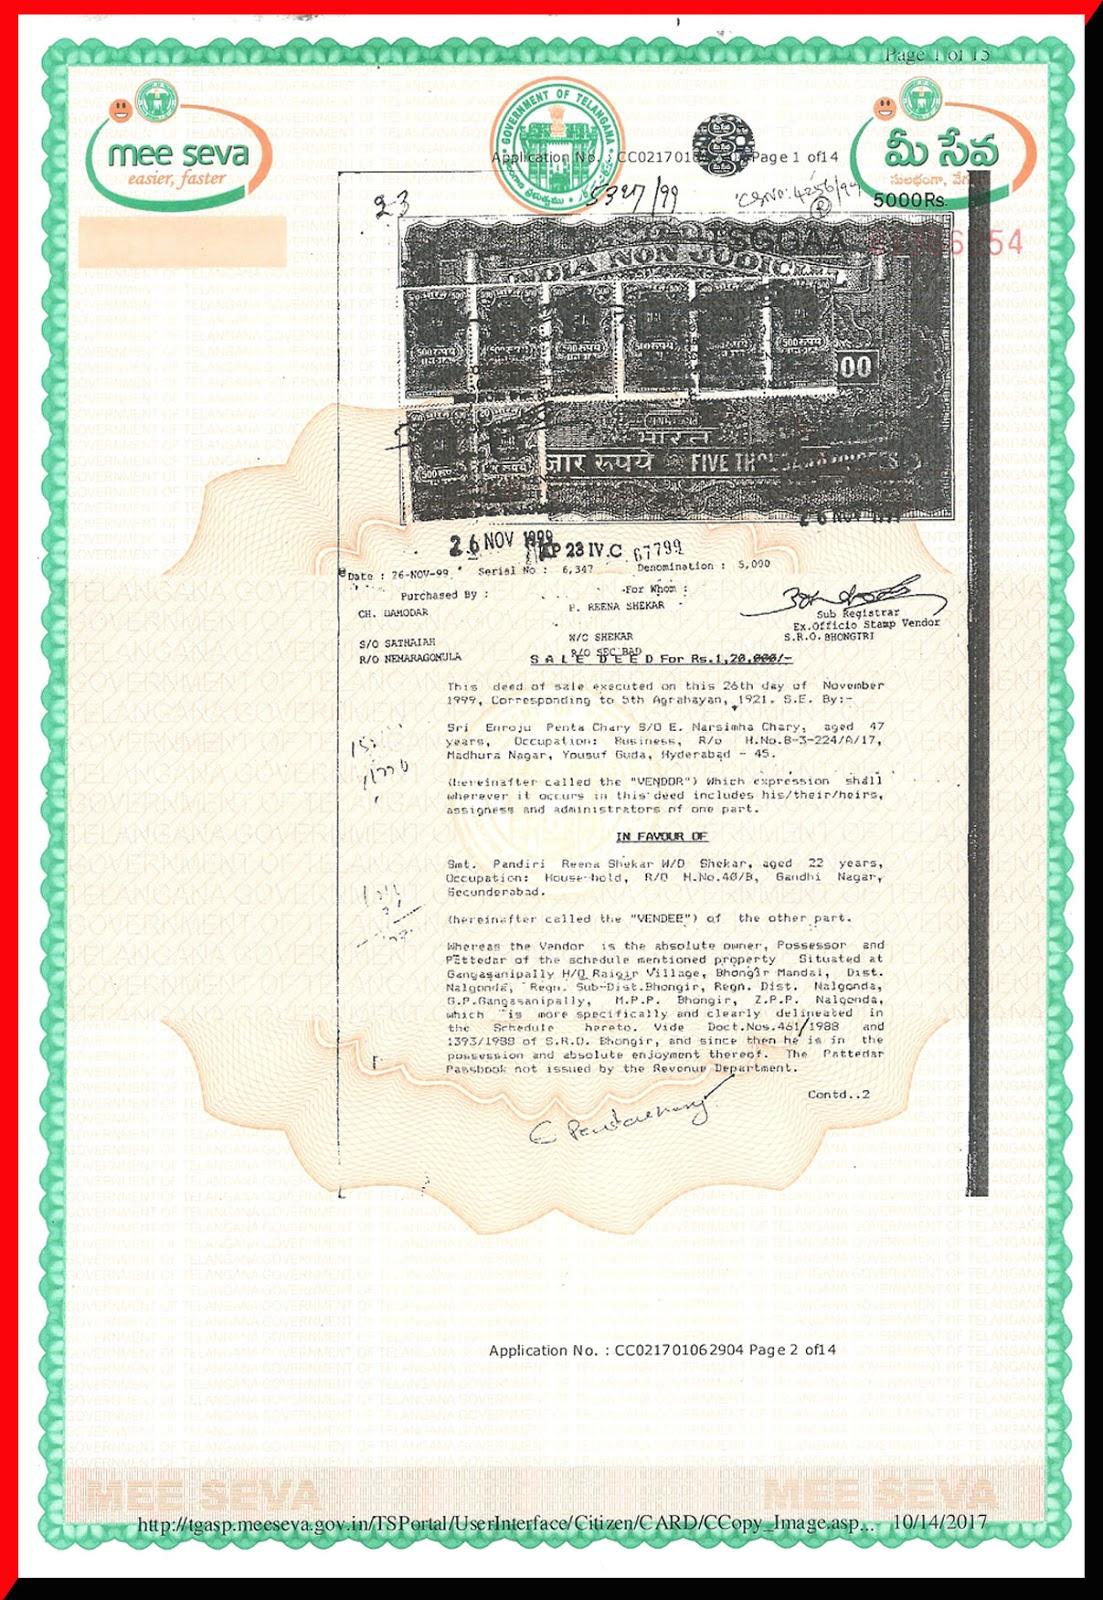 Sale Deed No. 5327 - 1999